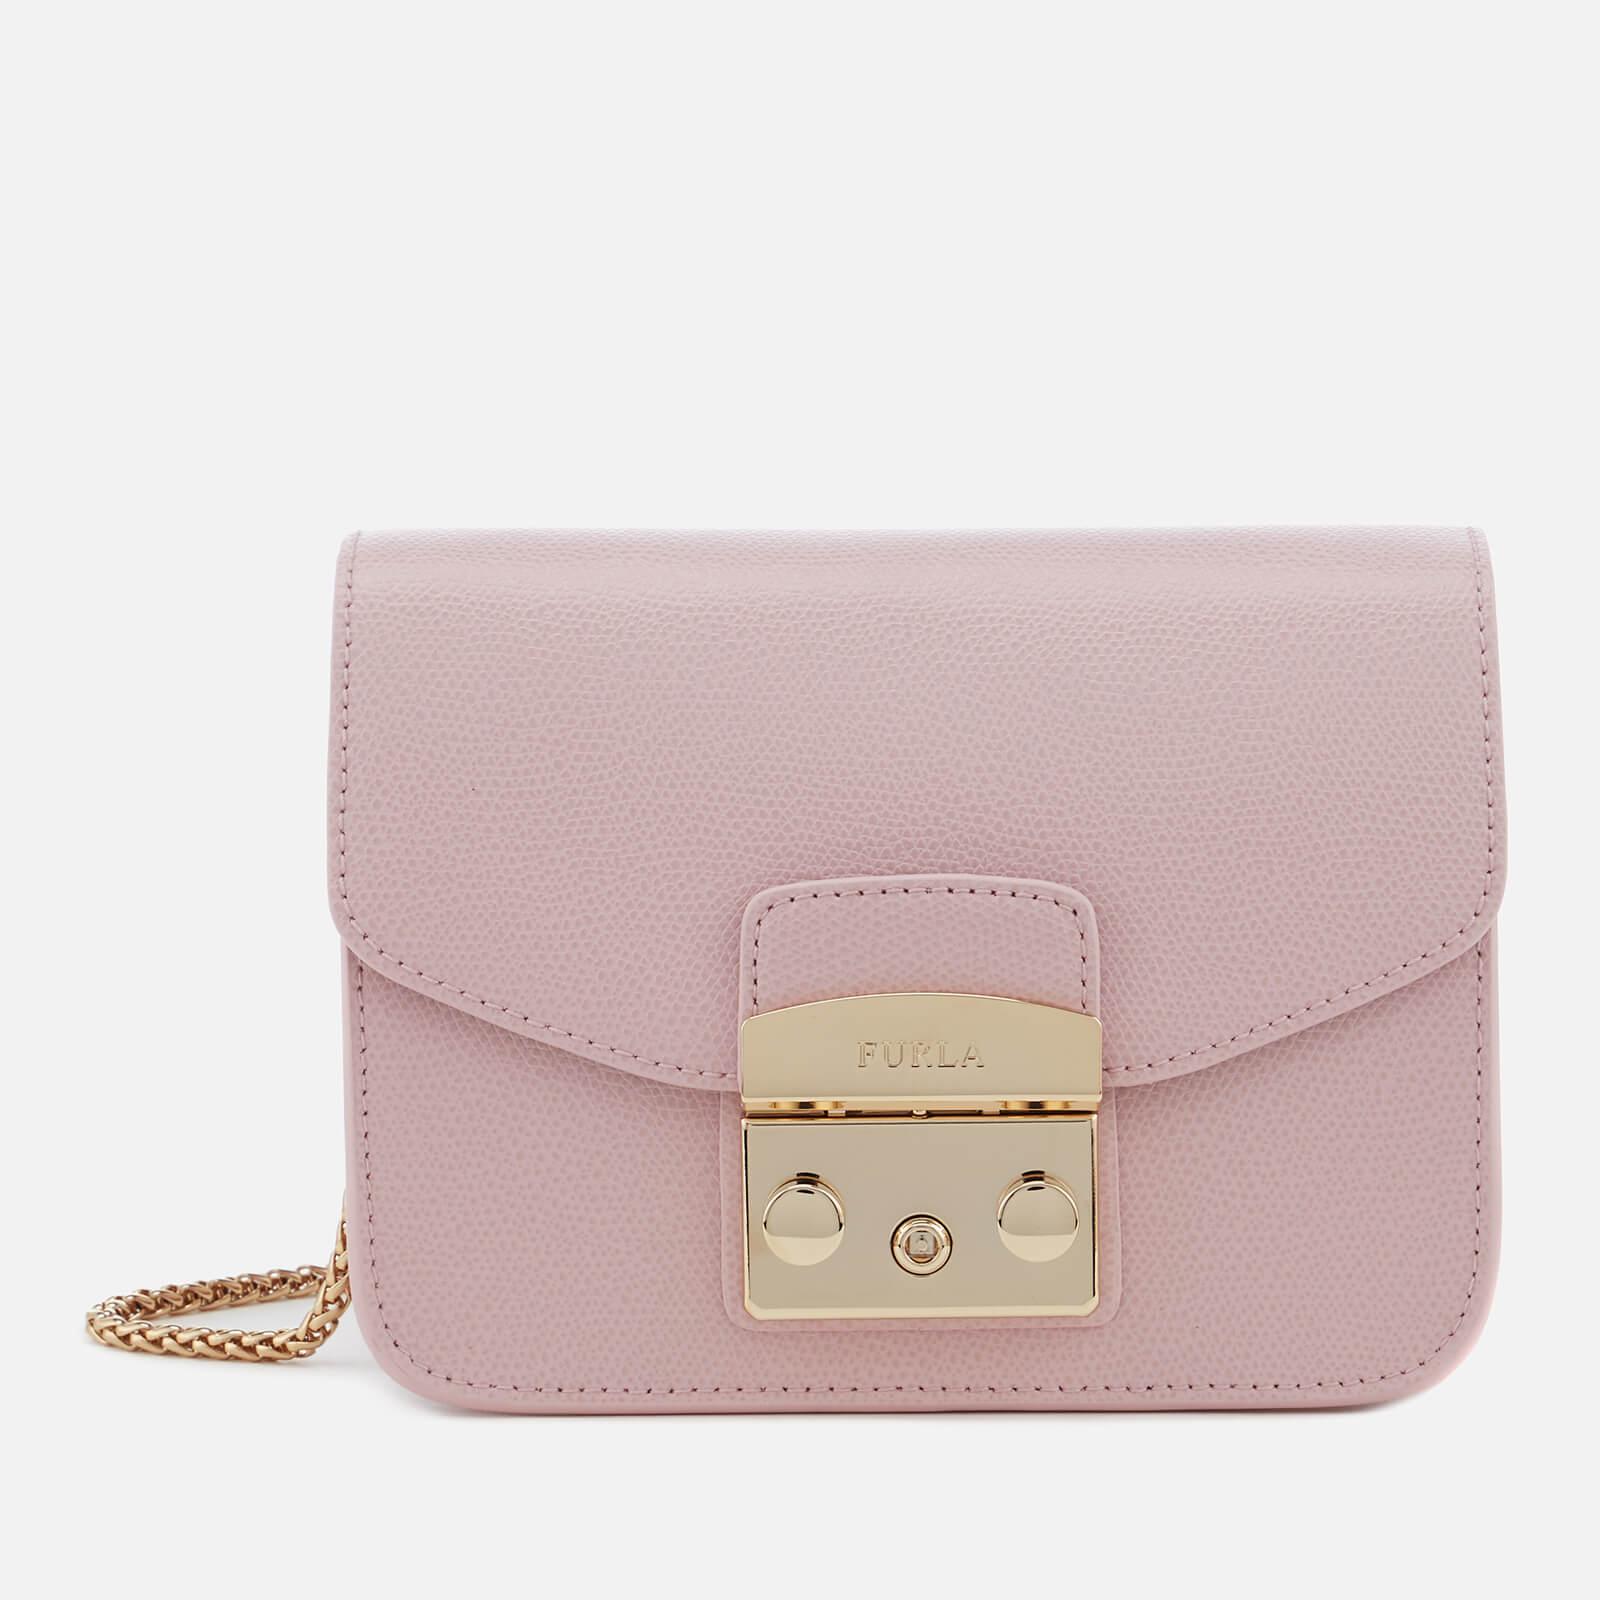 Furla Women's Metropolis Mini Cross Body Bag - Blush